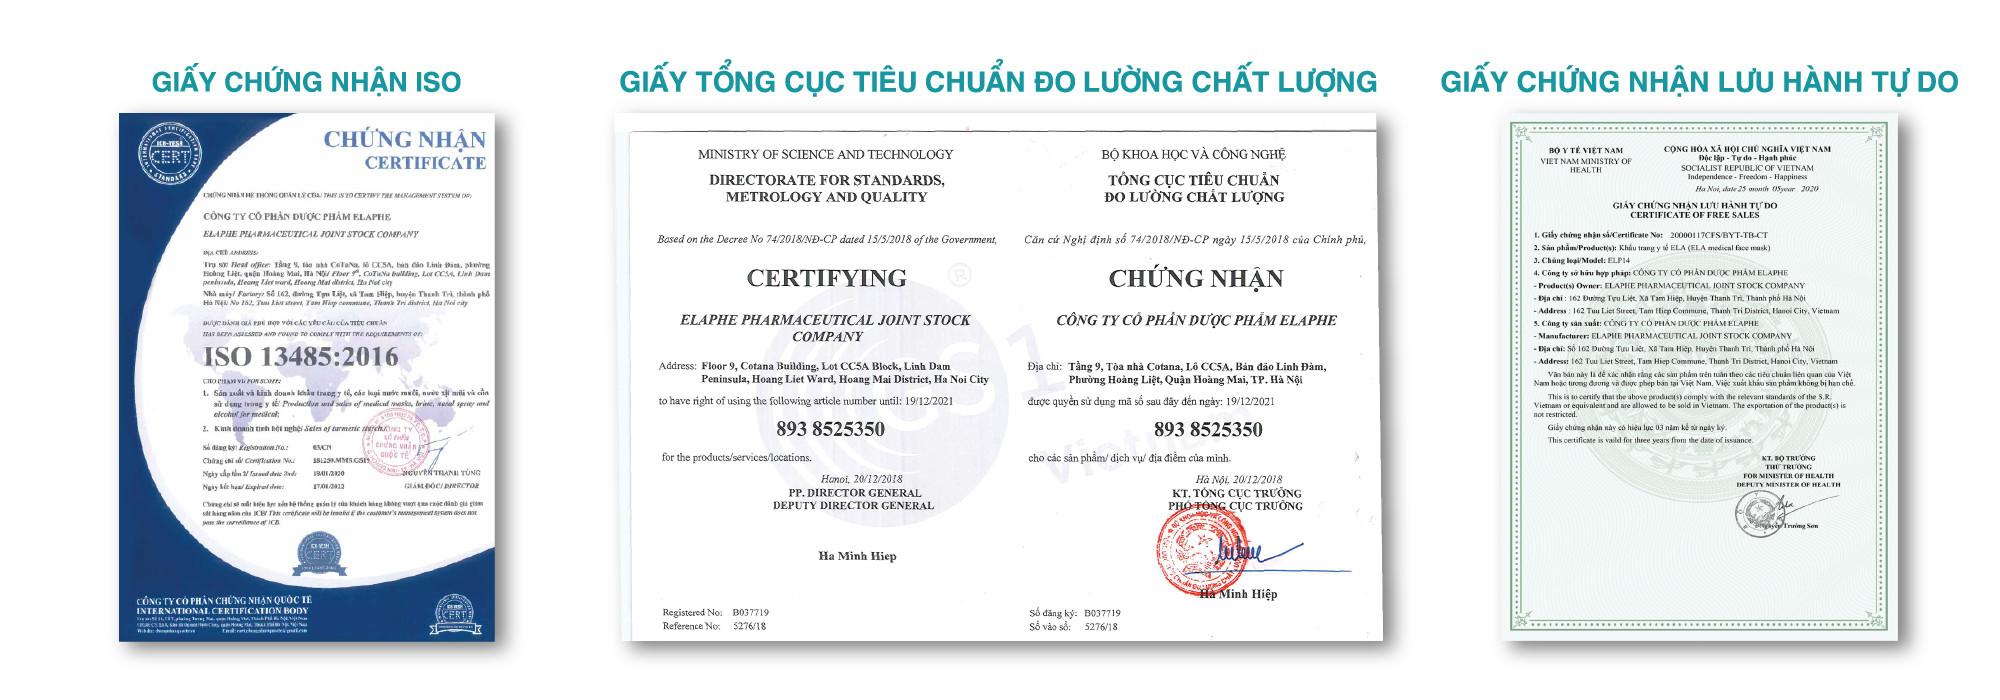 giấy chứng nhận elaphe